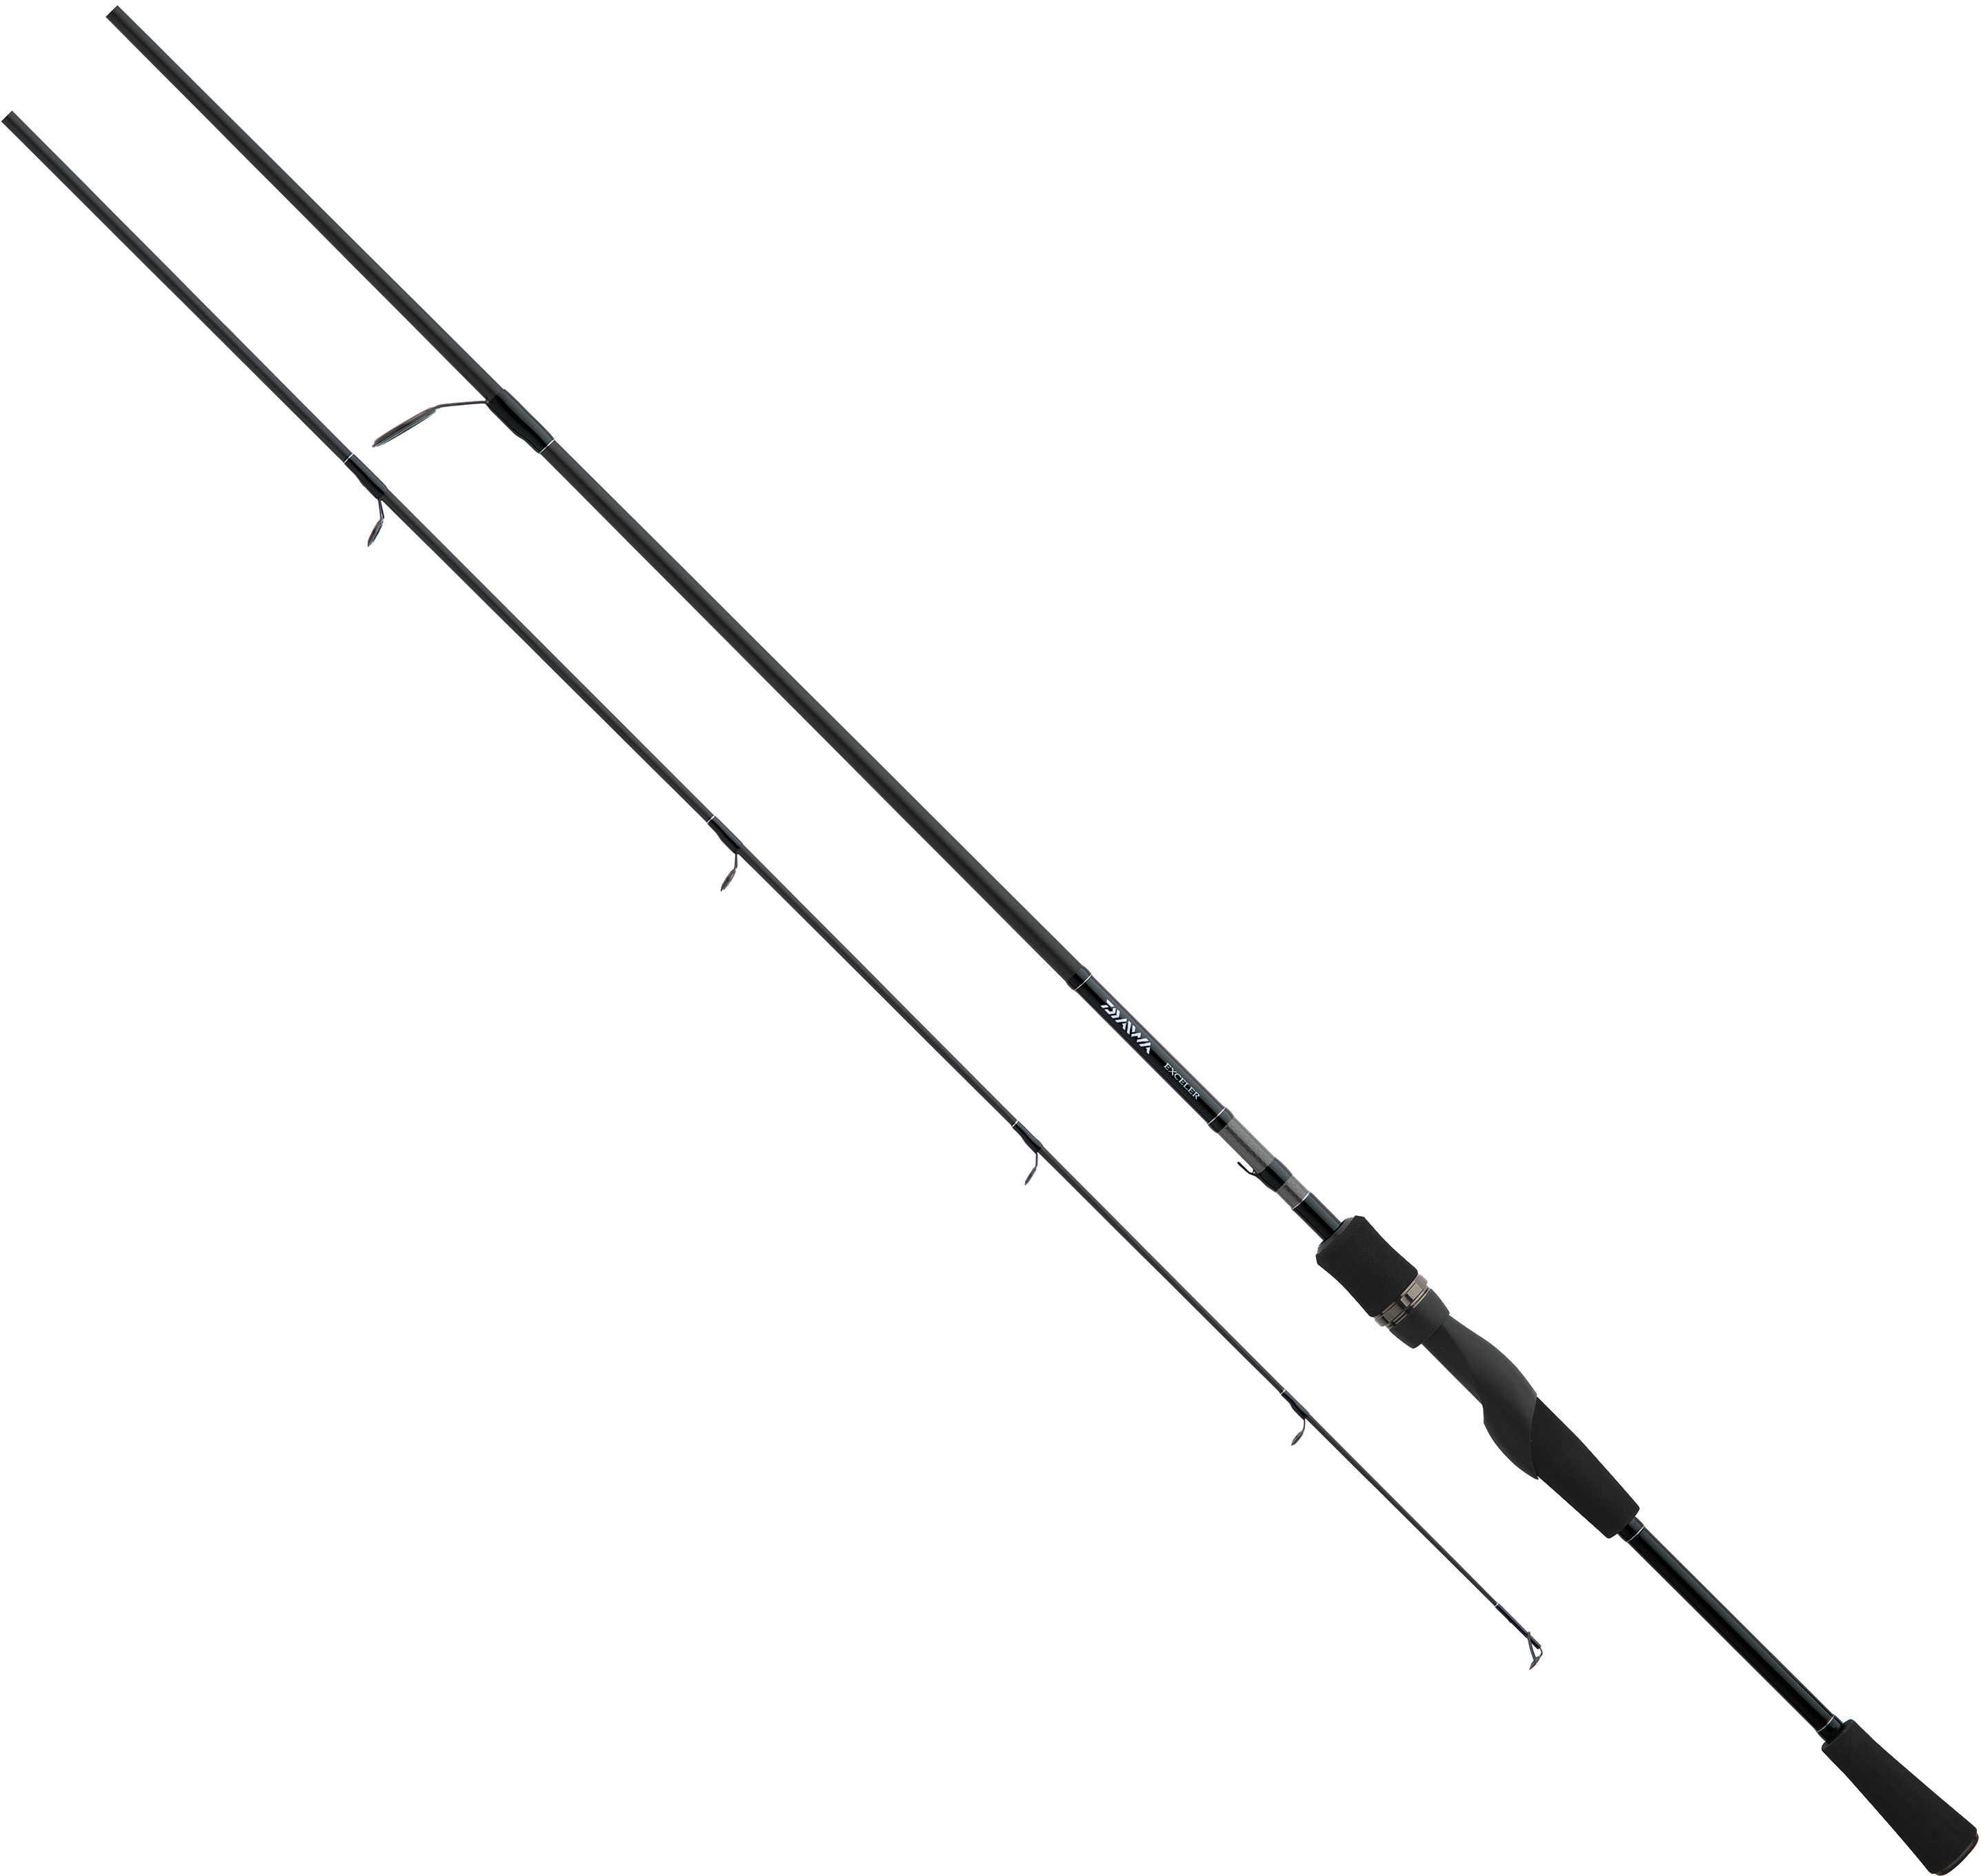 "Daiwa Exceler Rod Spinning, 6'6"", Medium/Heavy Md: Spinning Rod EXE661MHXS"